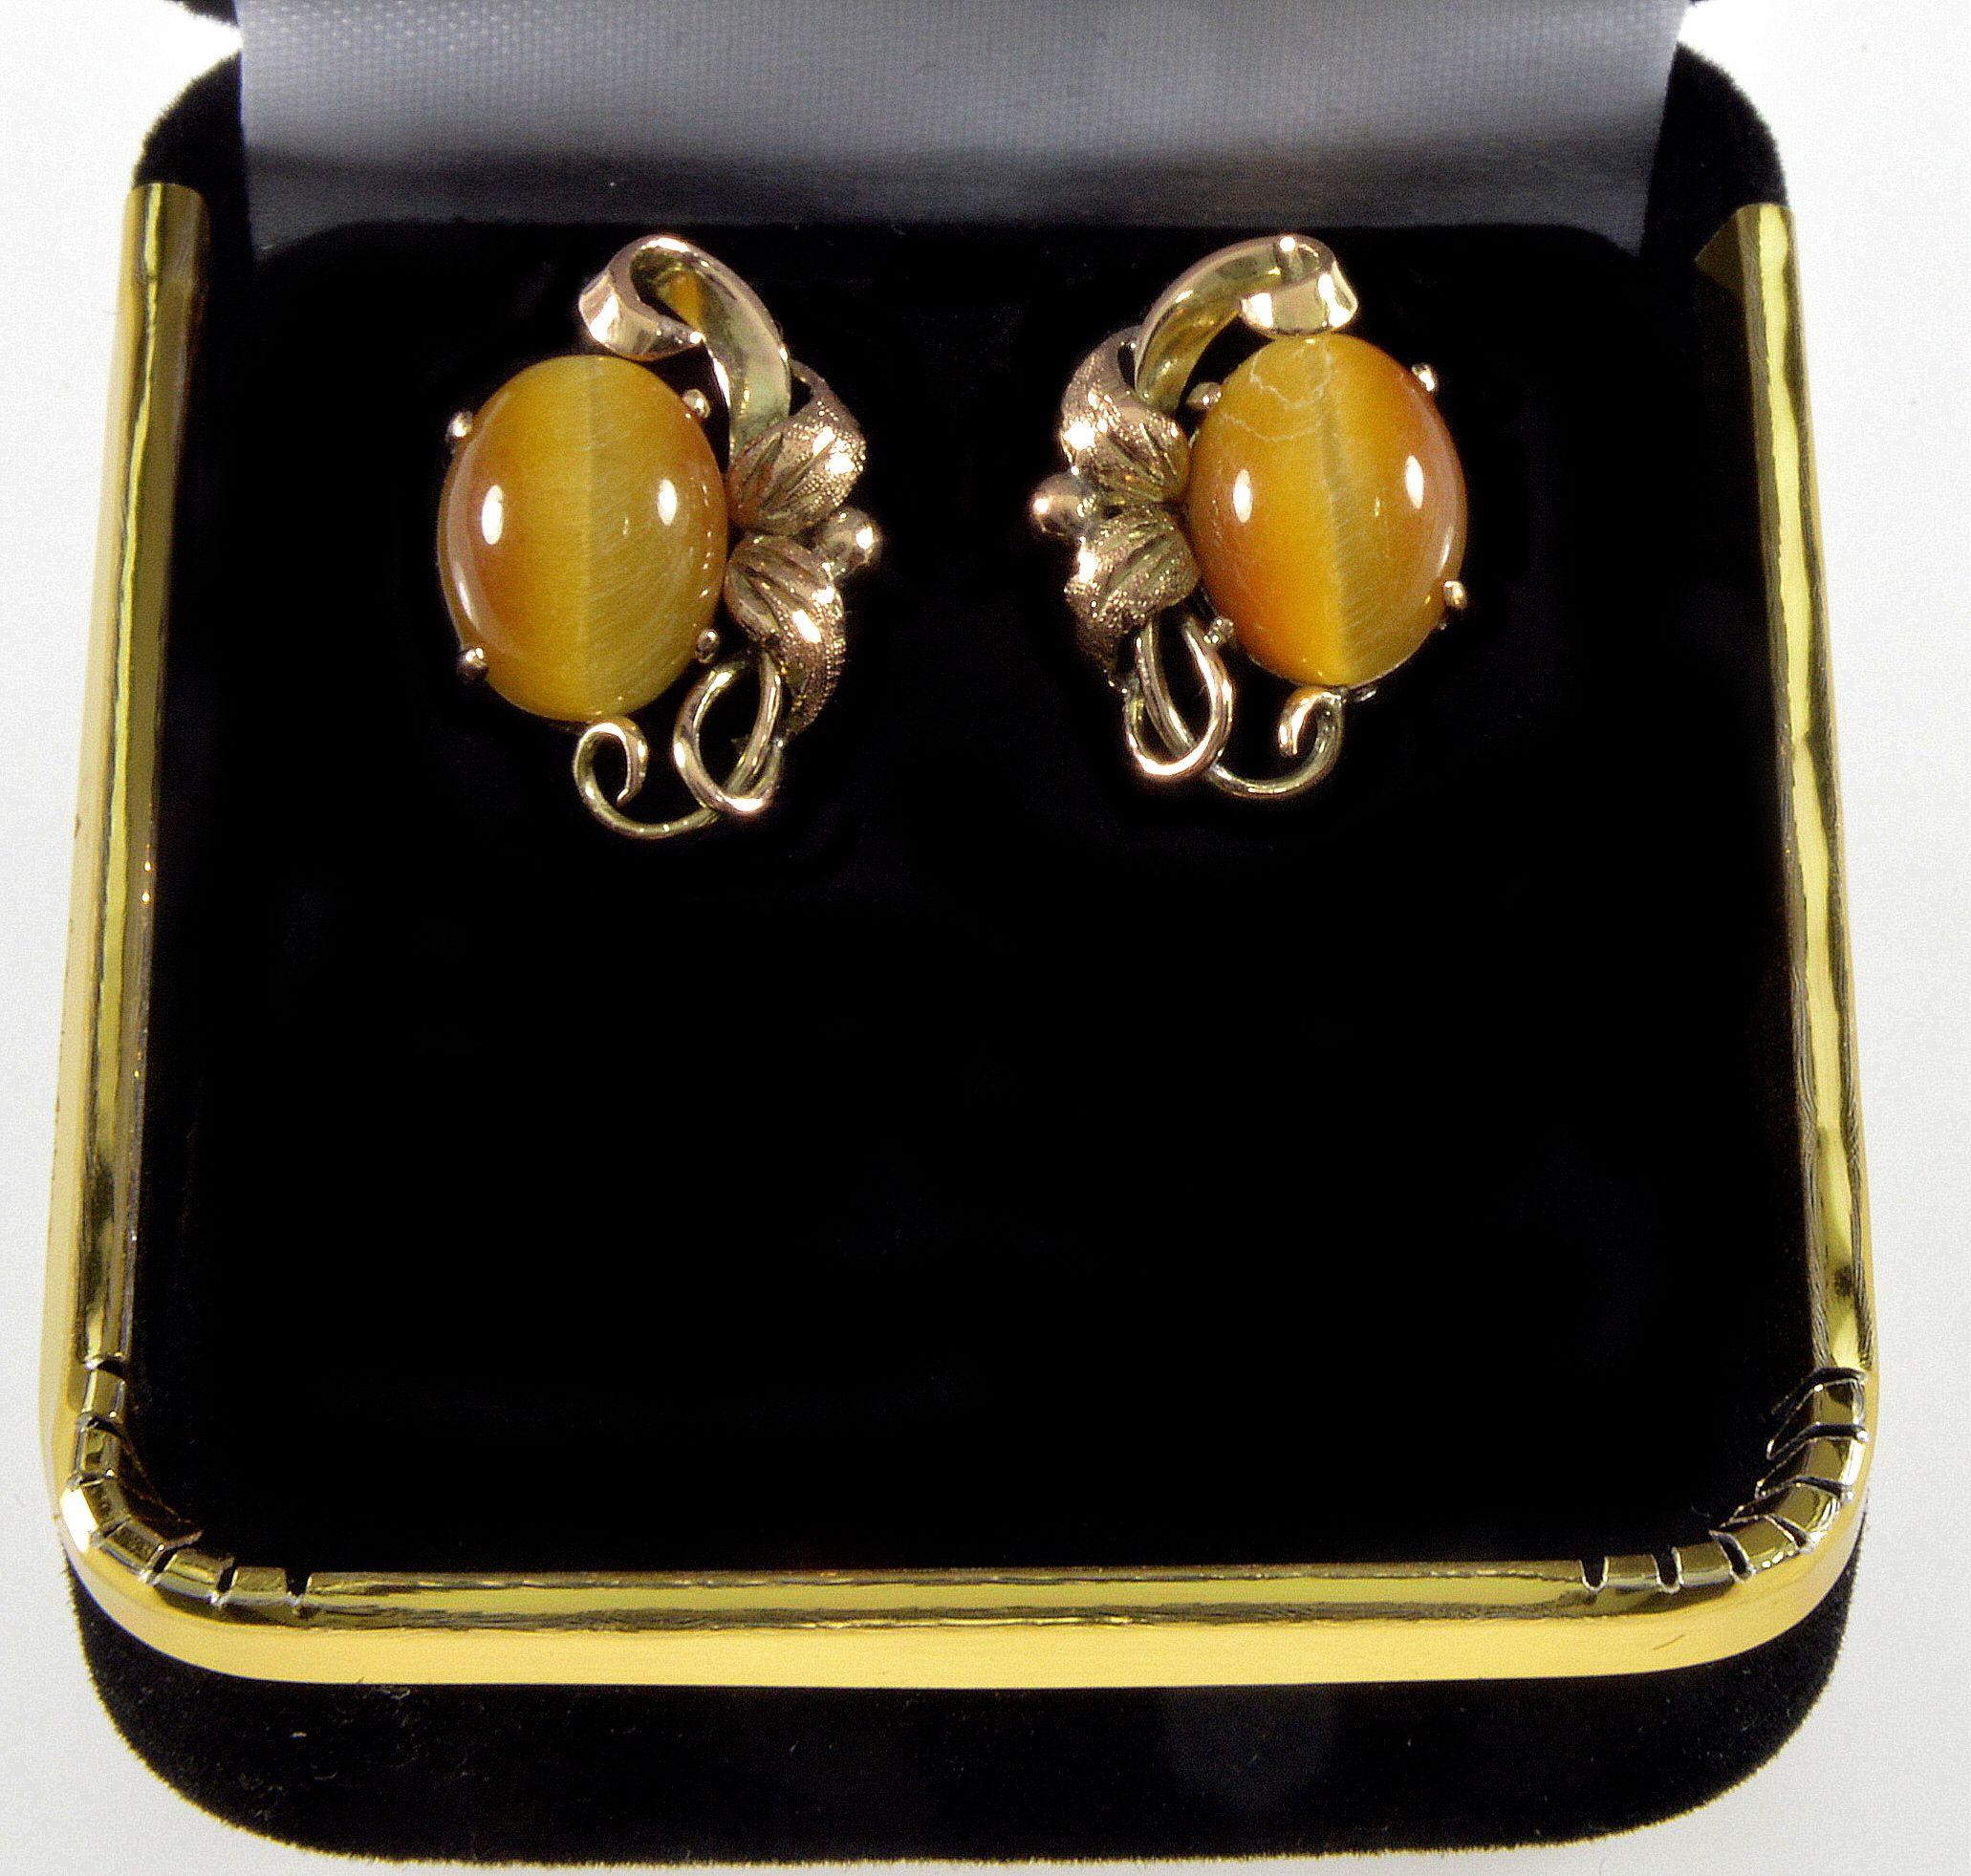 Antique Victorian 14K Gold Cat's Eye Chrysoberyl Earrings